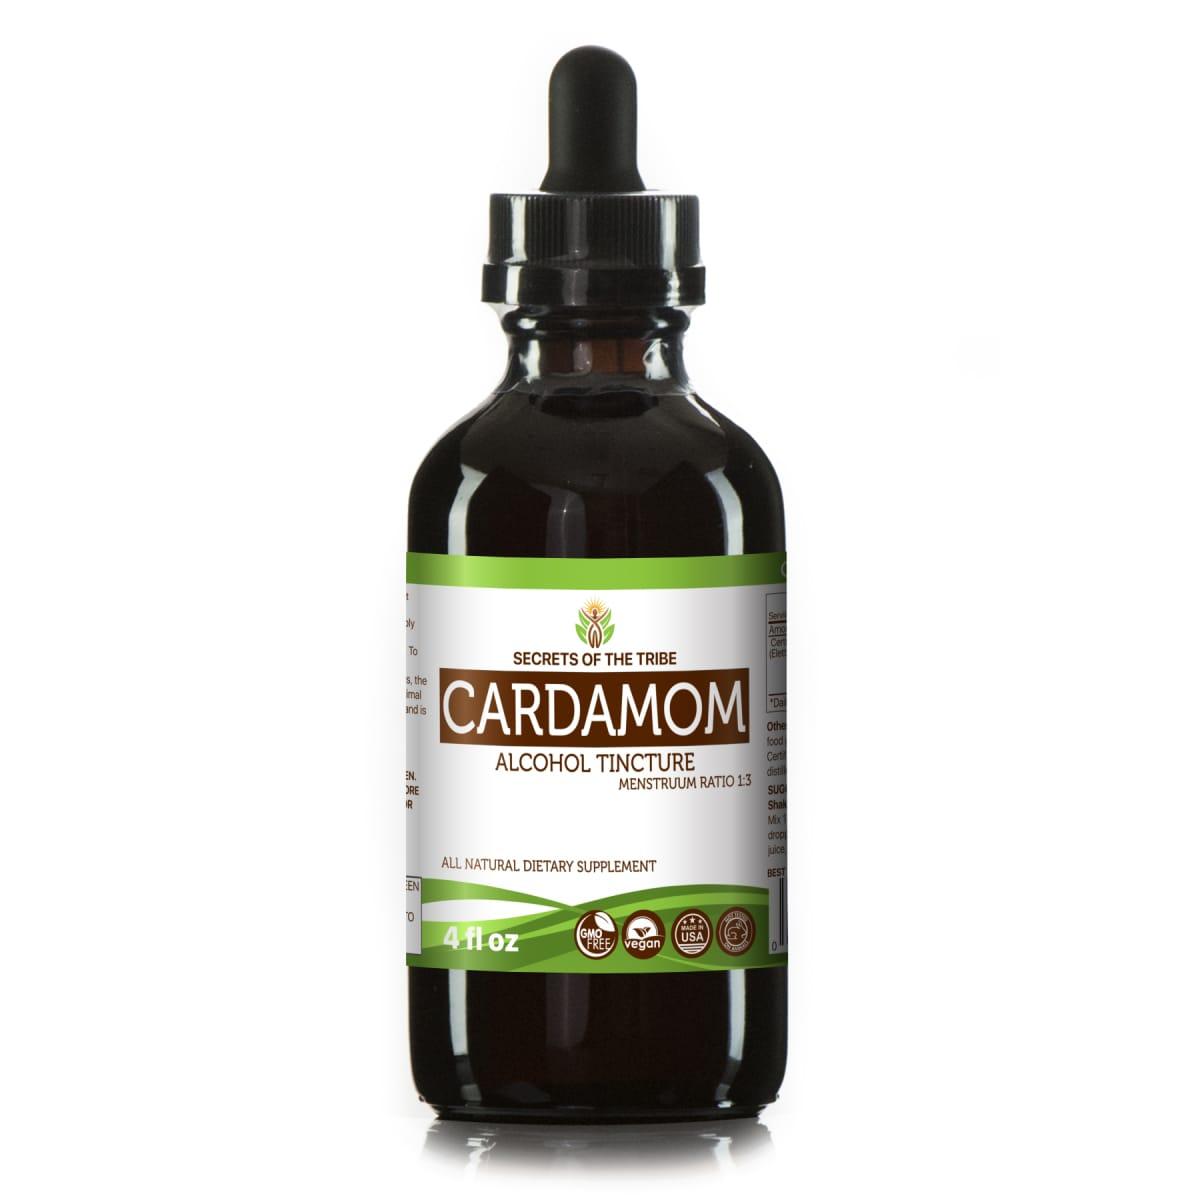 Cardamom Tincture Alcohol Extract, Organic Cardamom (Elettaria cardamomum) Dried Seed 4 oz